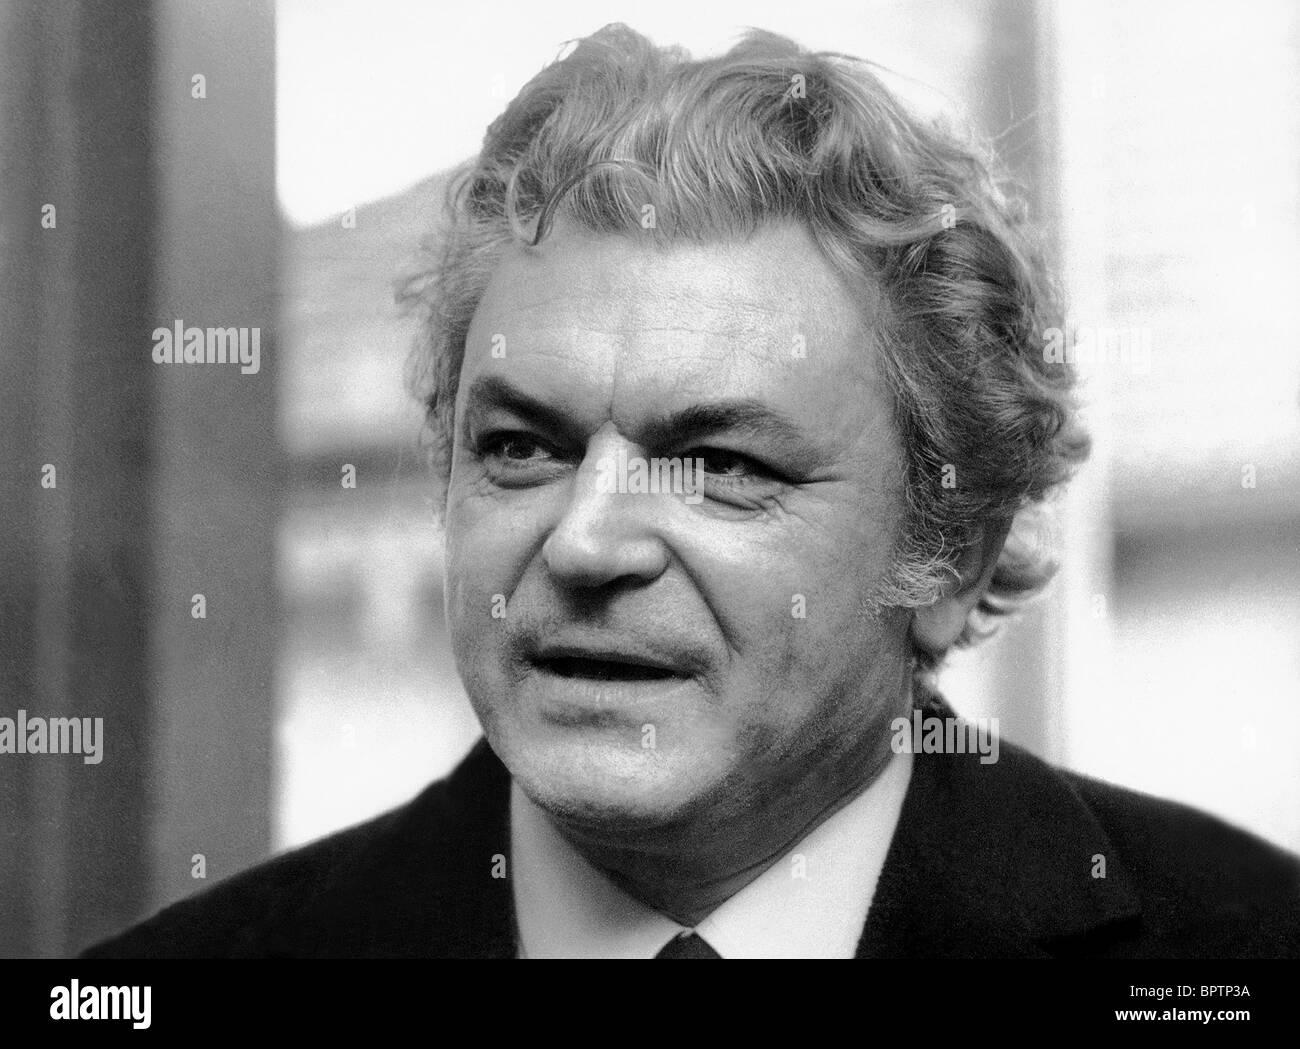 SERGEI BONDARCHUK ACTOR DIRECTOR & WRITER (1975) - Stock Image